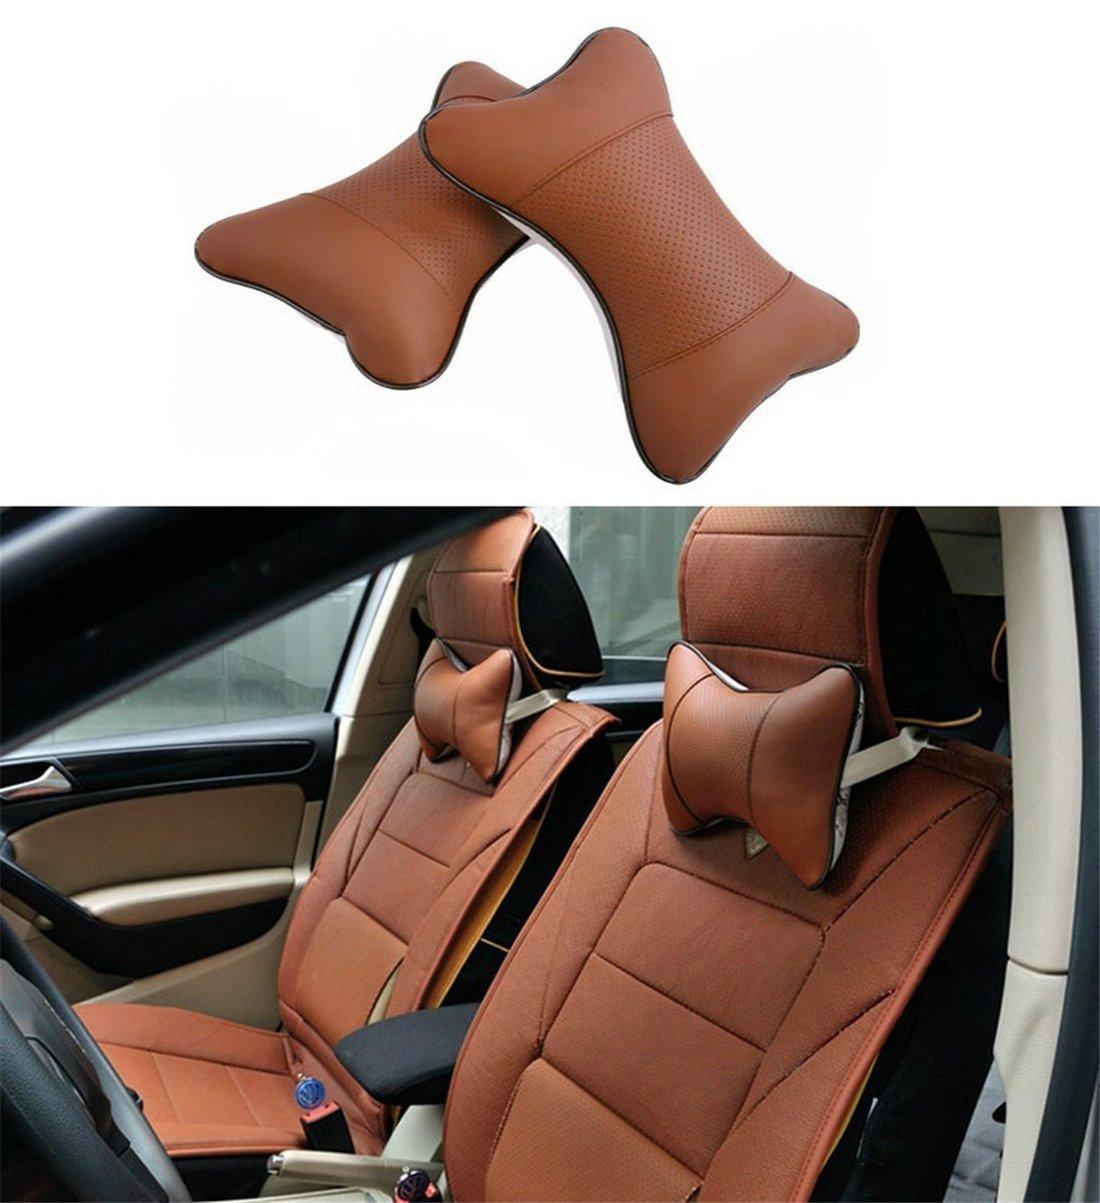 SunnyKun 2pcs Universal Leather Car Headrest Pillow Pad Car Seat Pillow Breathable Car Auto Head Neck Rest Cushion (Black)